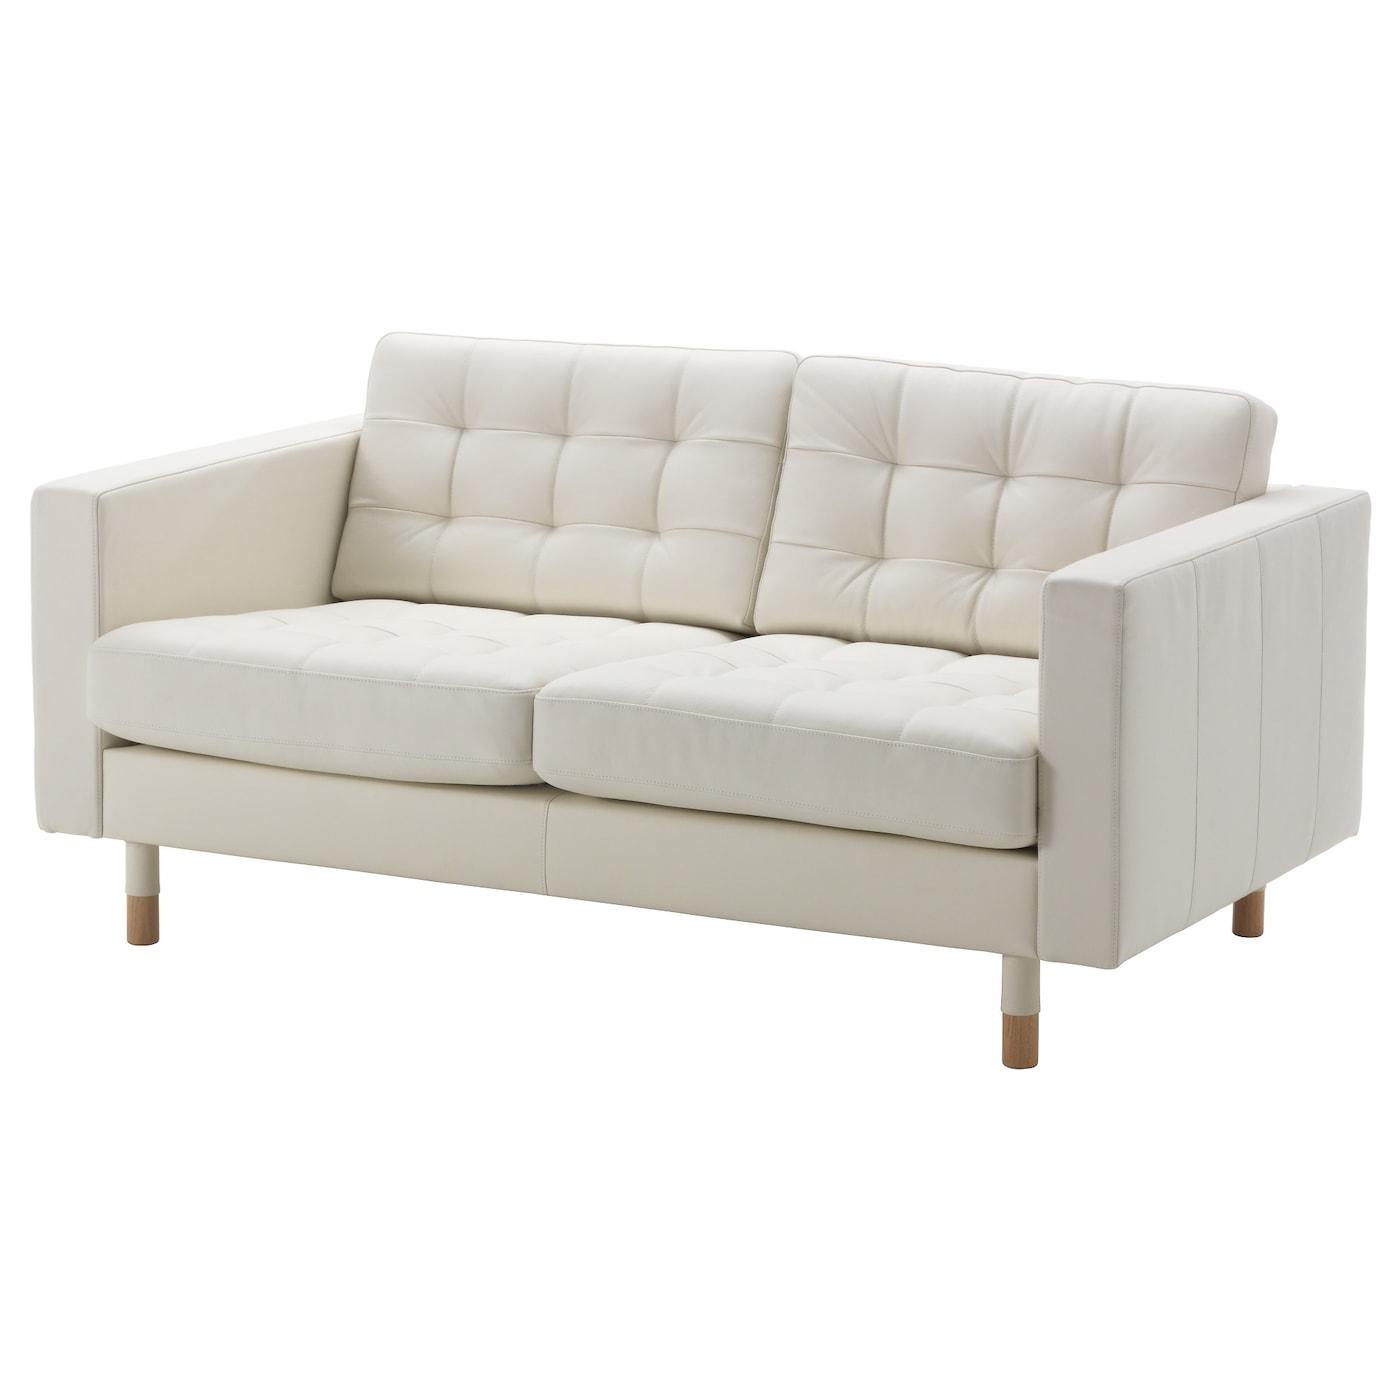 landskrona two seat sofa grann bomstad white wood ikea. Black Bedroom Furniture Sets. Home Design Ideas